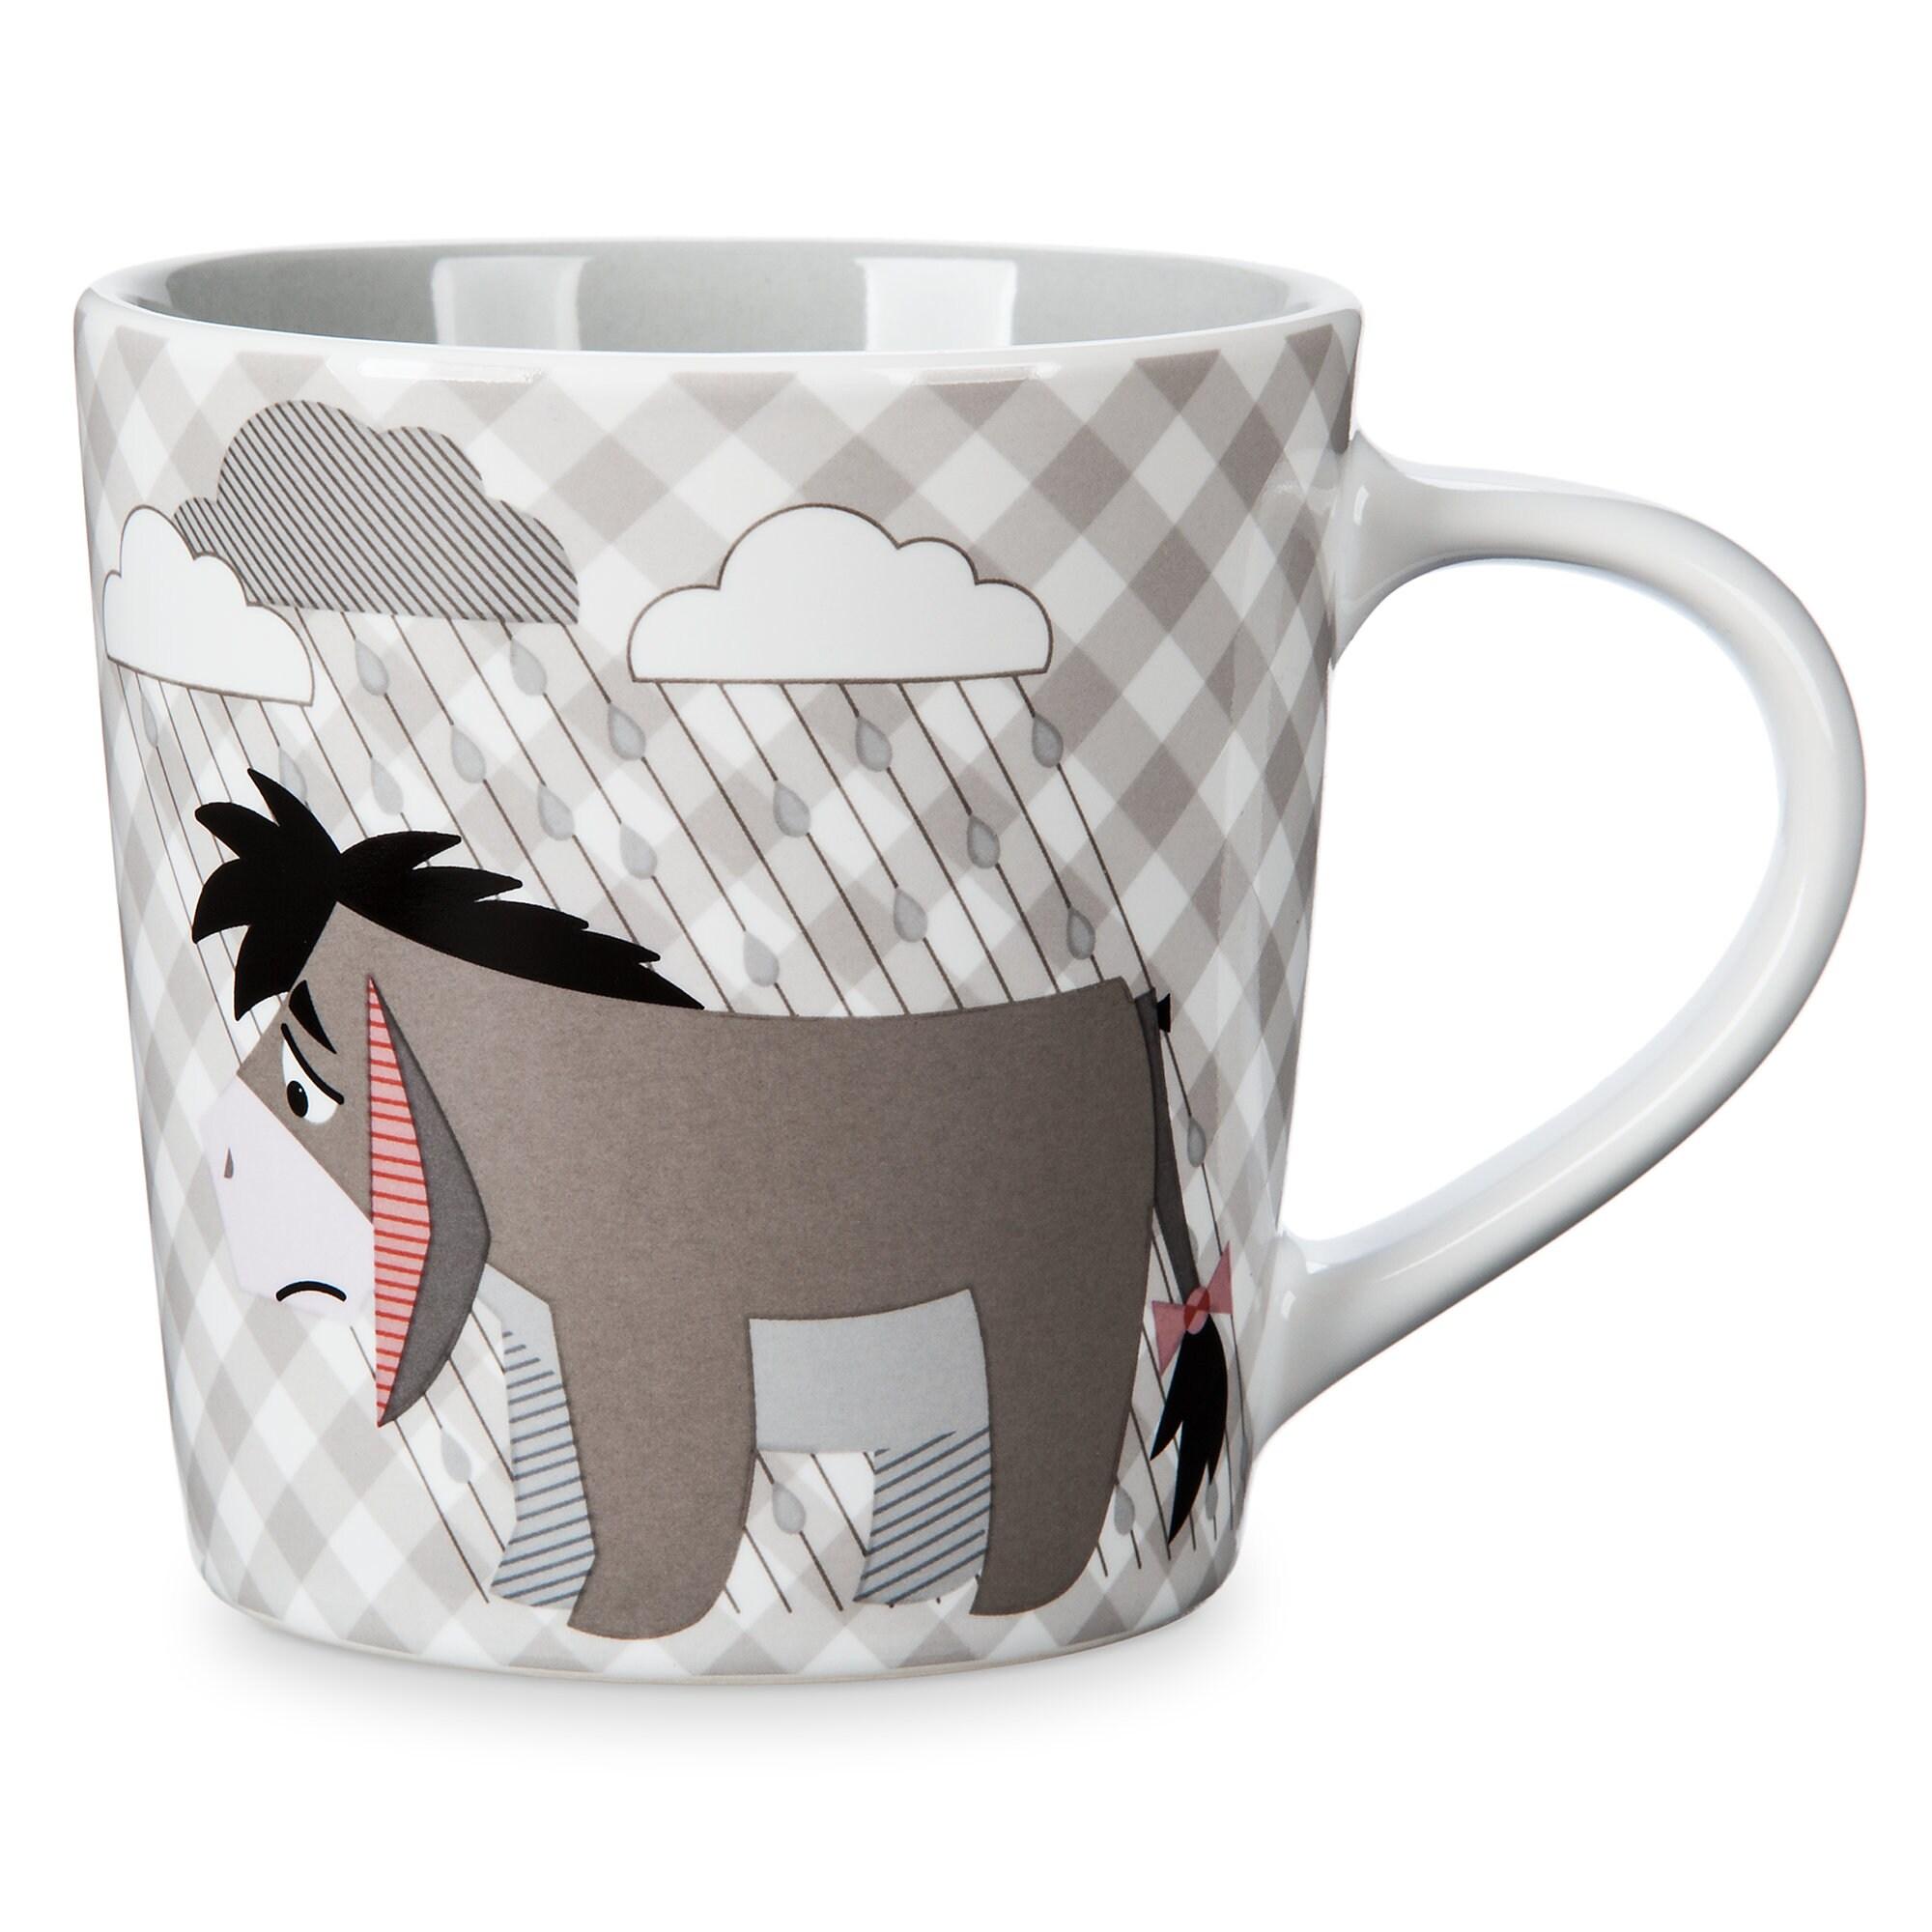 Eeyore Checkered Mug